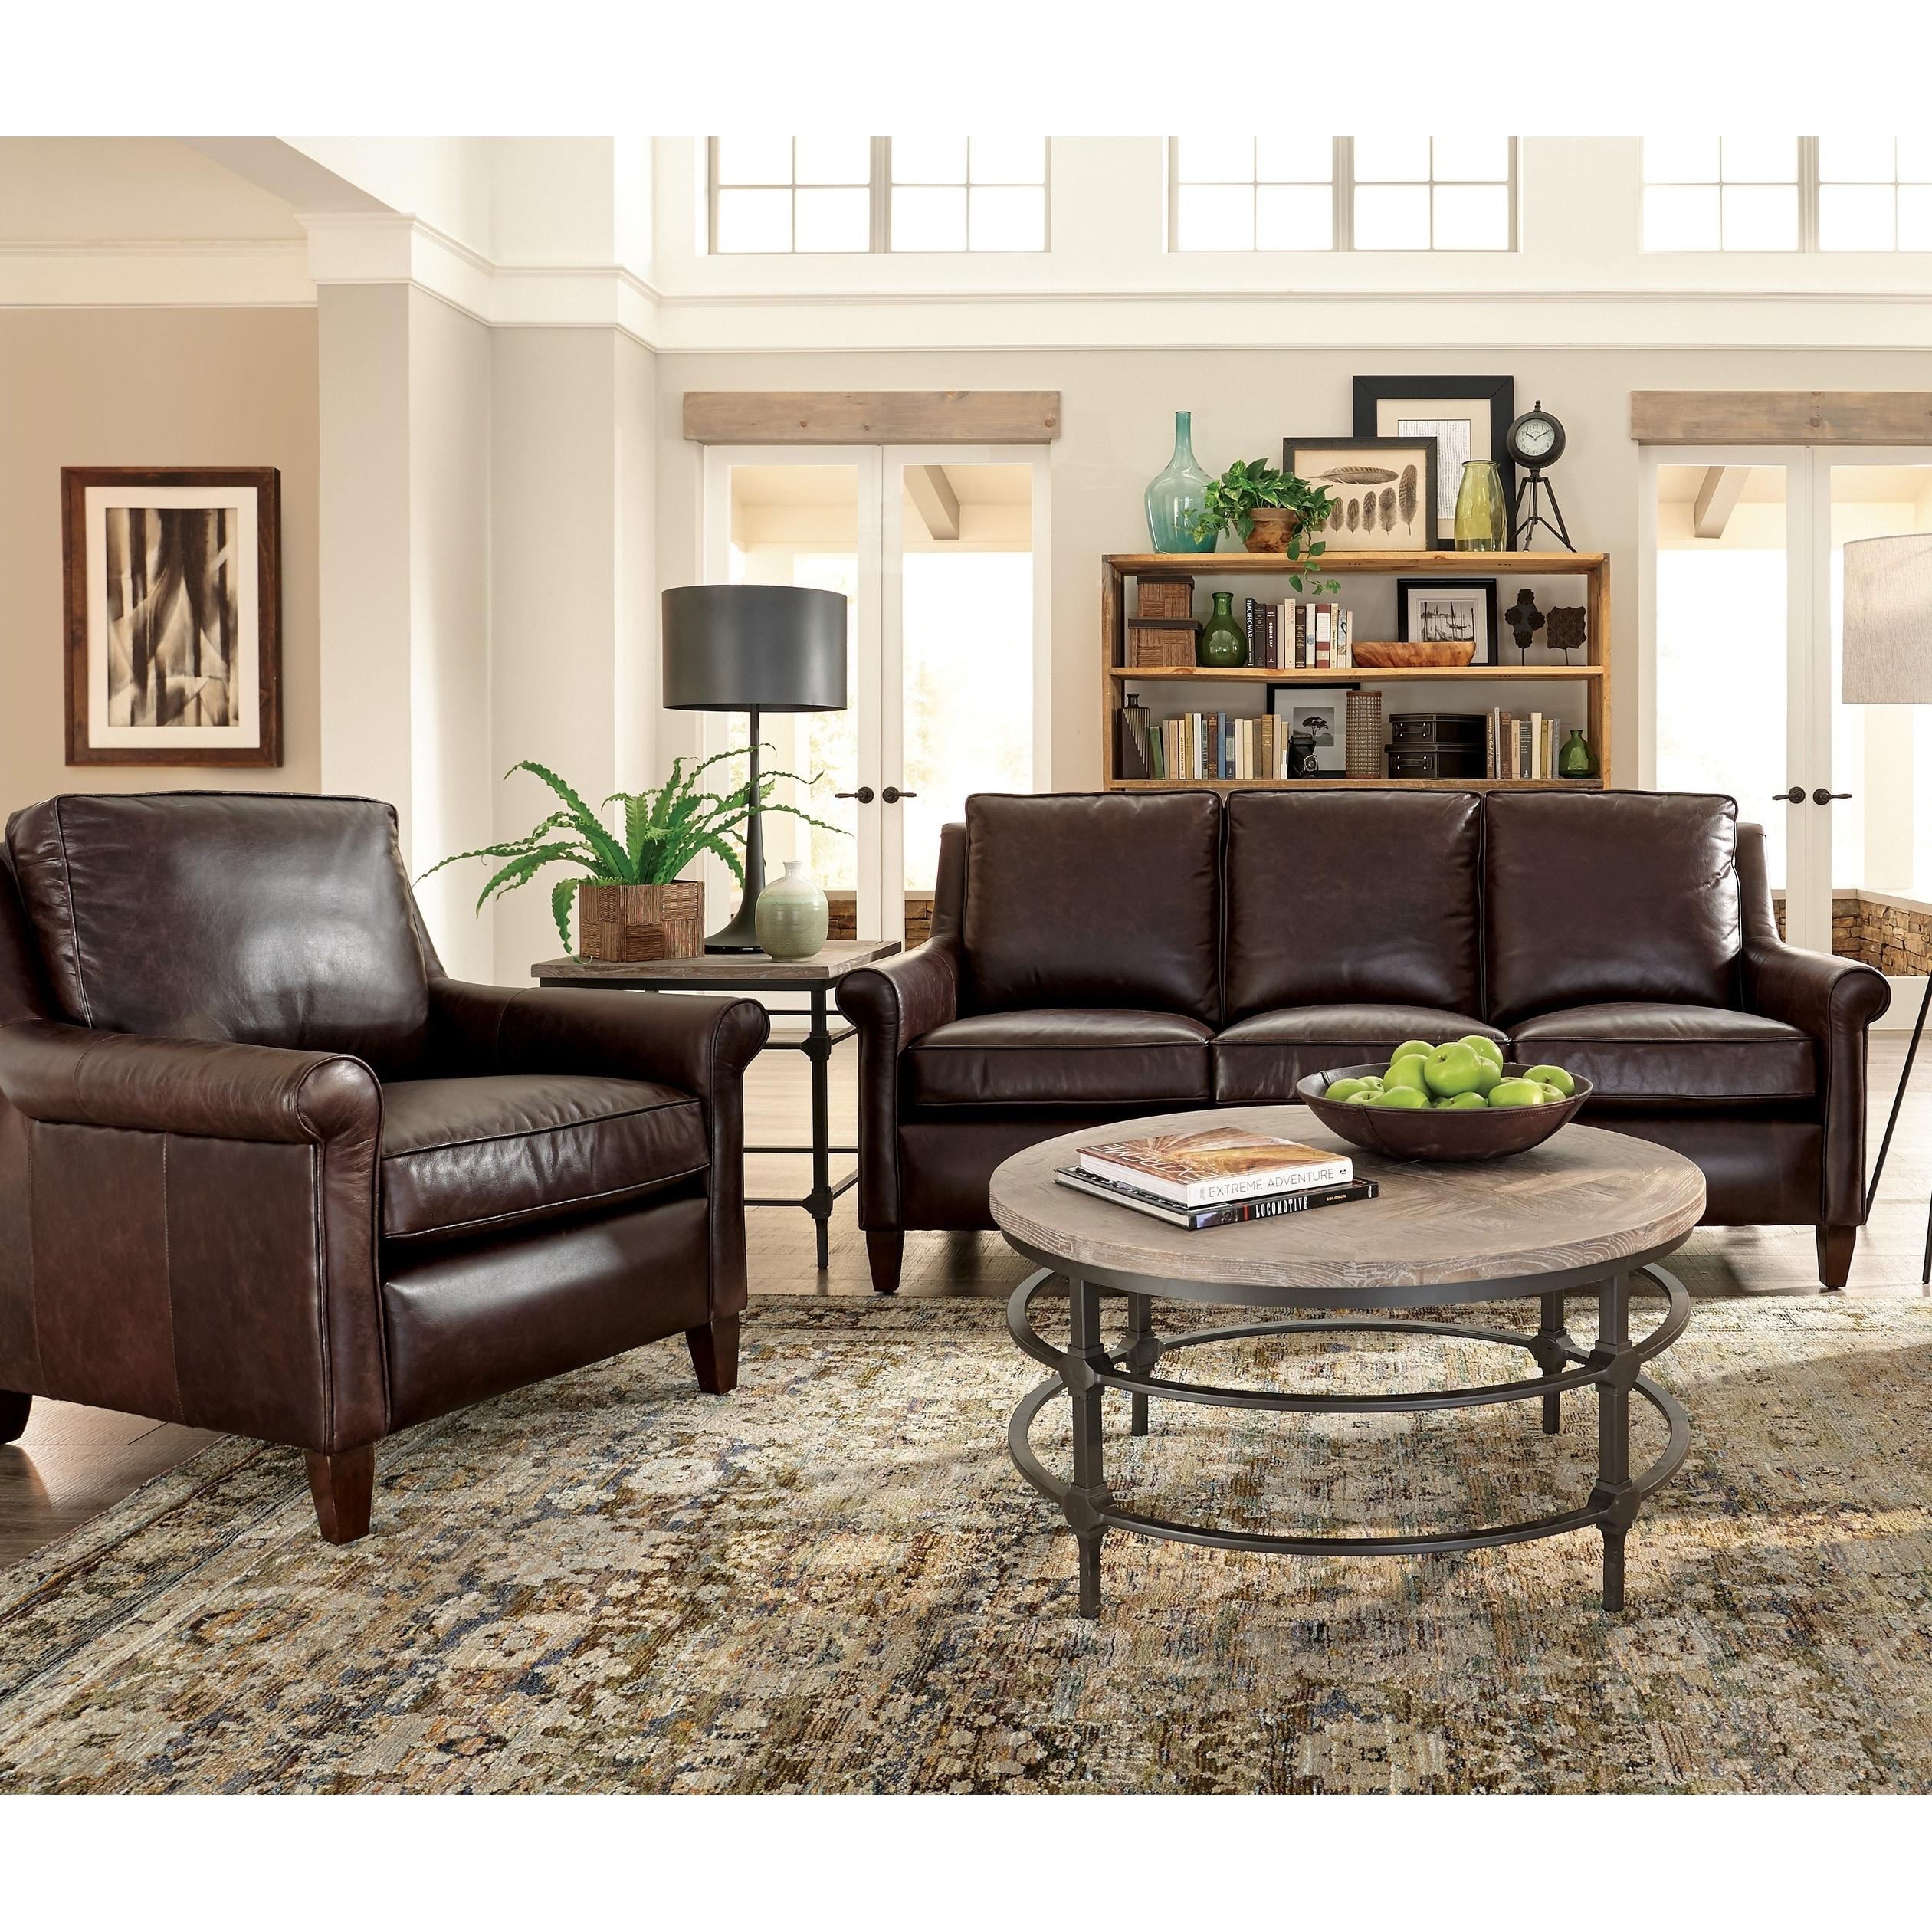 Terrific Jericho Two Piece Dark Brown Leather Sofa And Chair Living Room Set Customarchery Wood Chair Design Ideas Customarcherynet